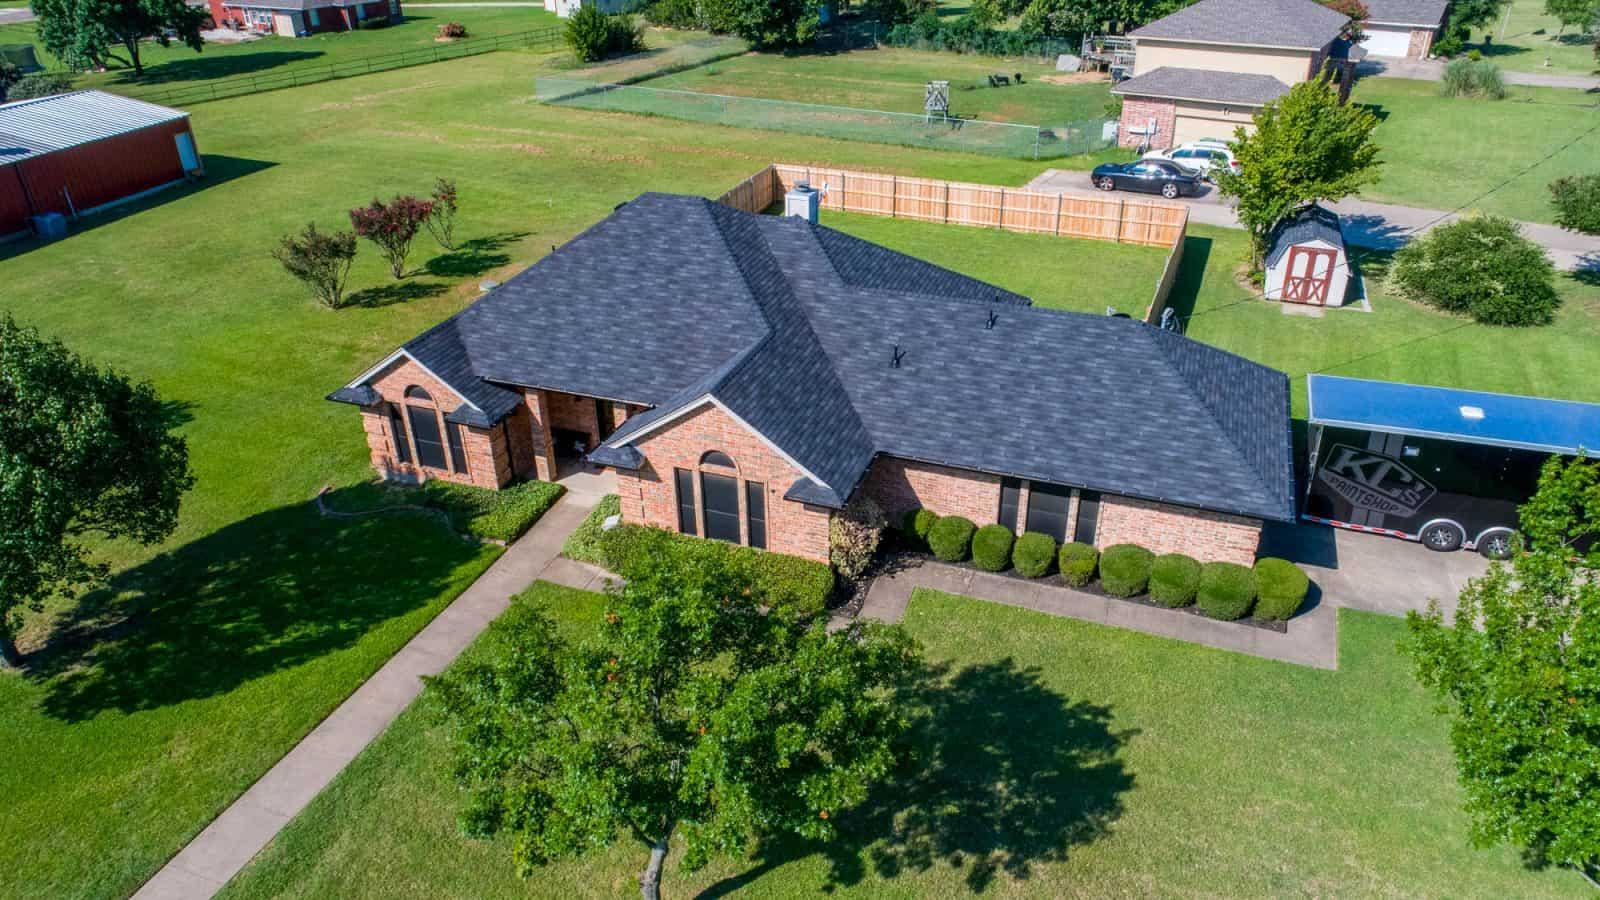 aerial photo of a Texas home